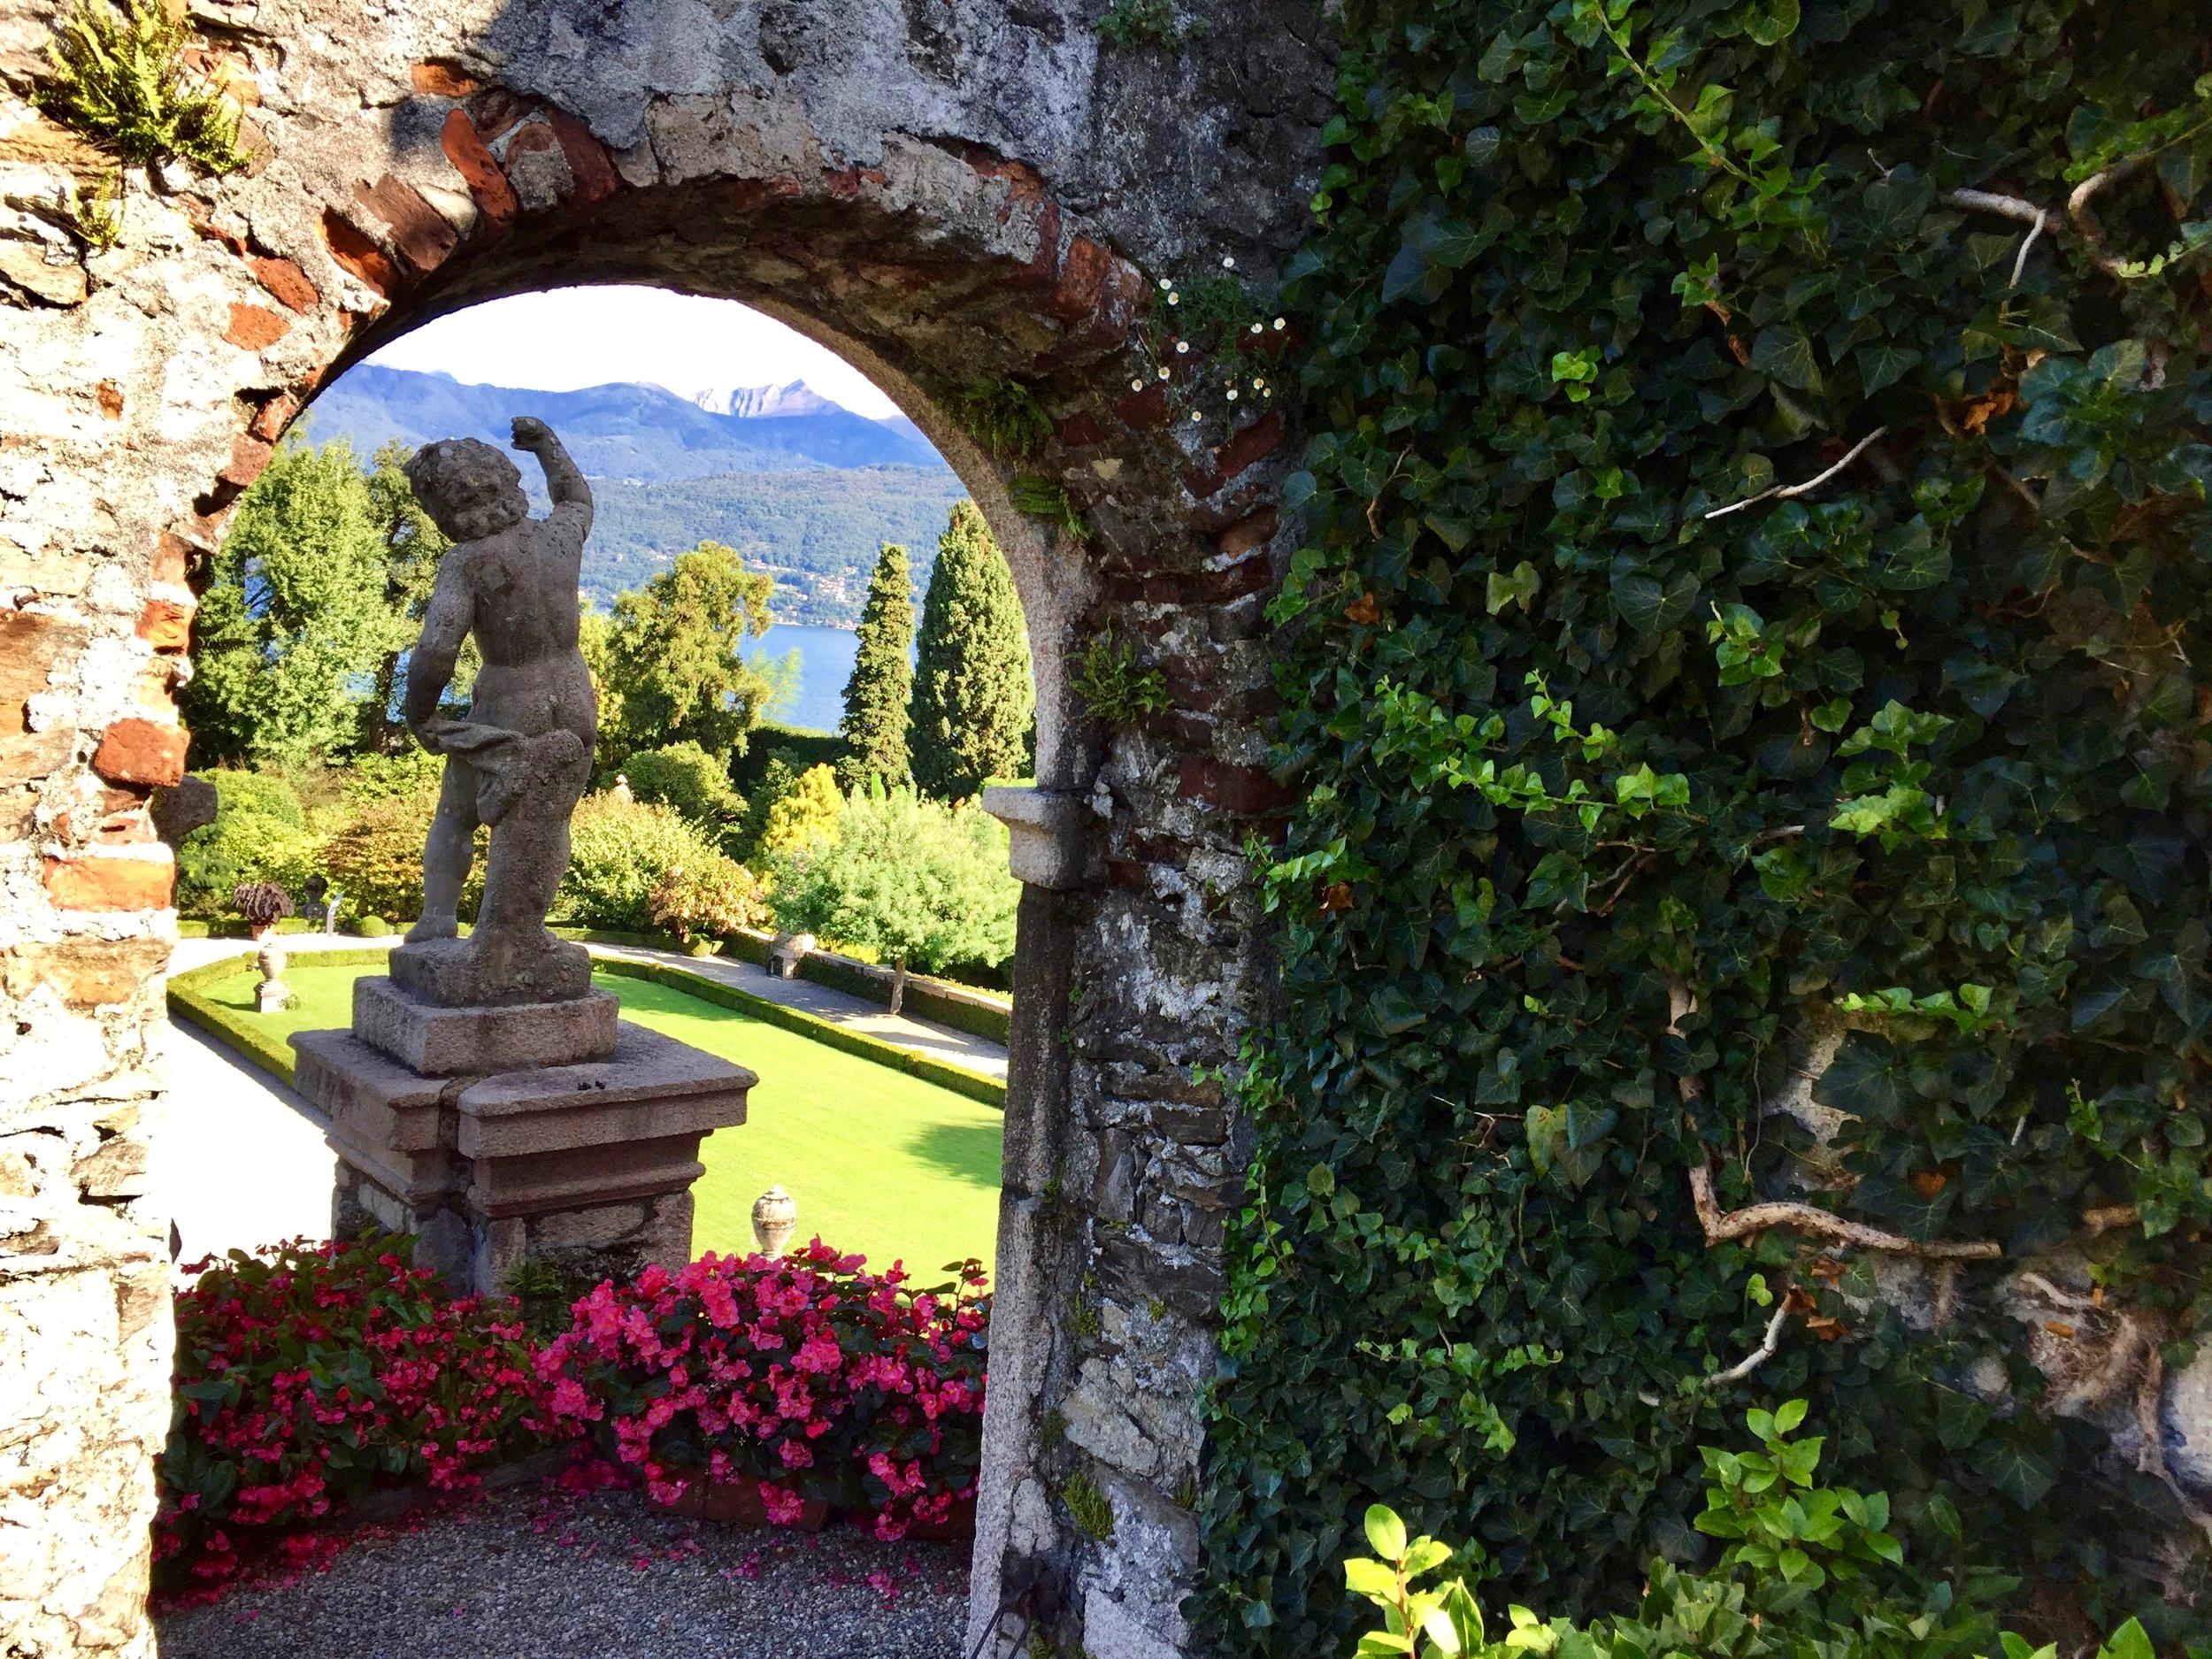 Lush botanical Ligurian gardens